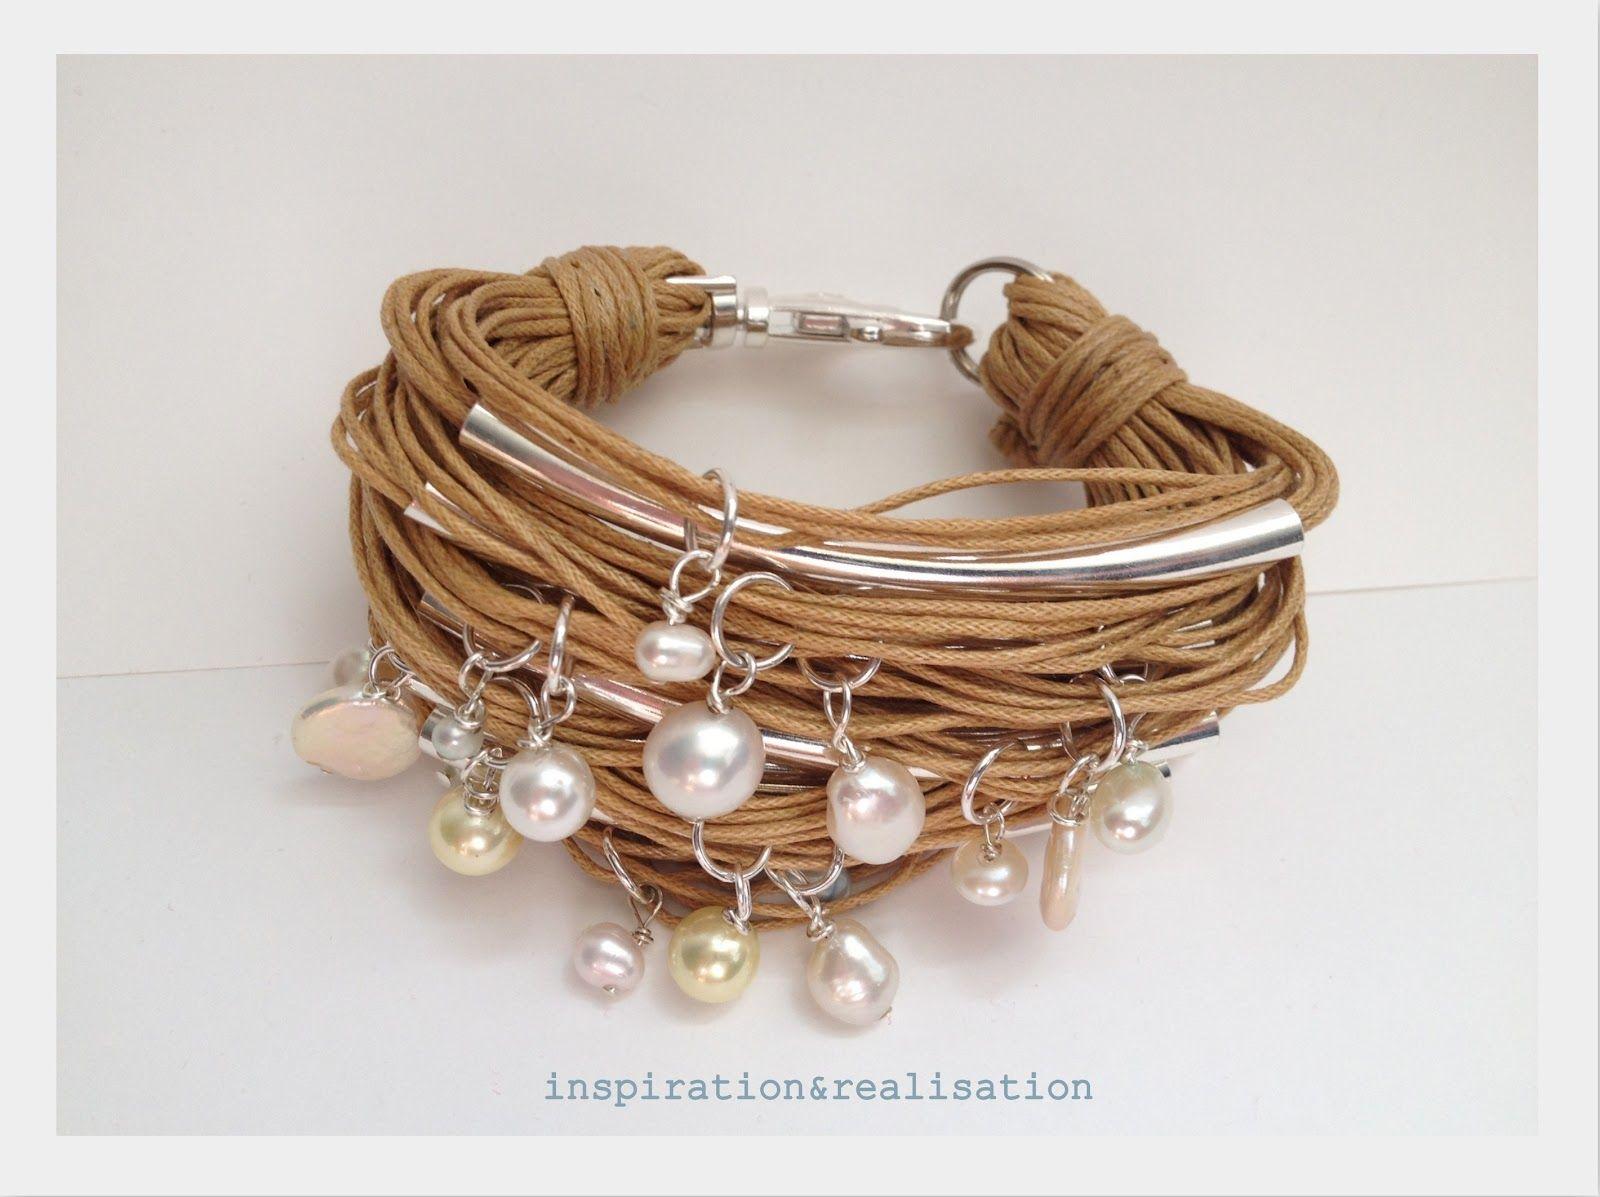 inspiration_bracelet_diy_tutorial.jpg 1600×1197 pikseli